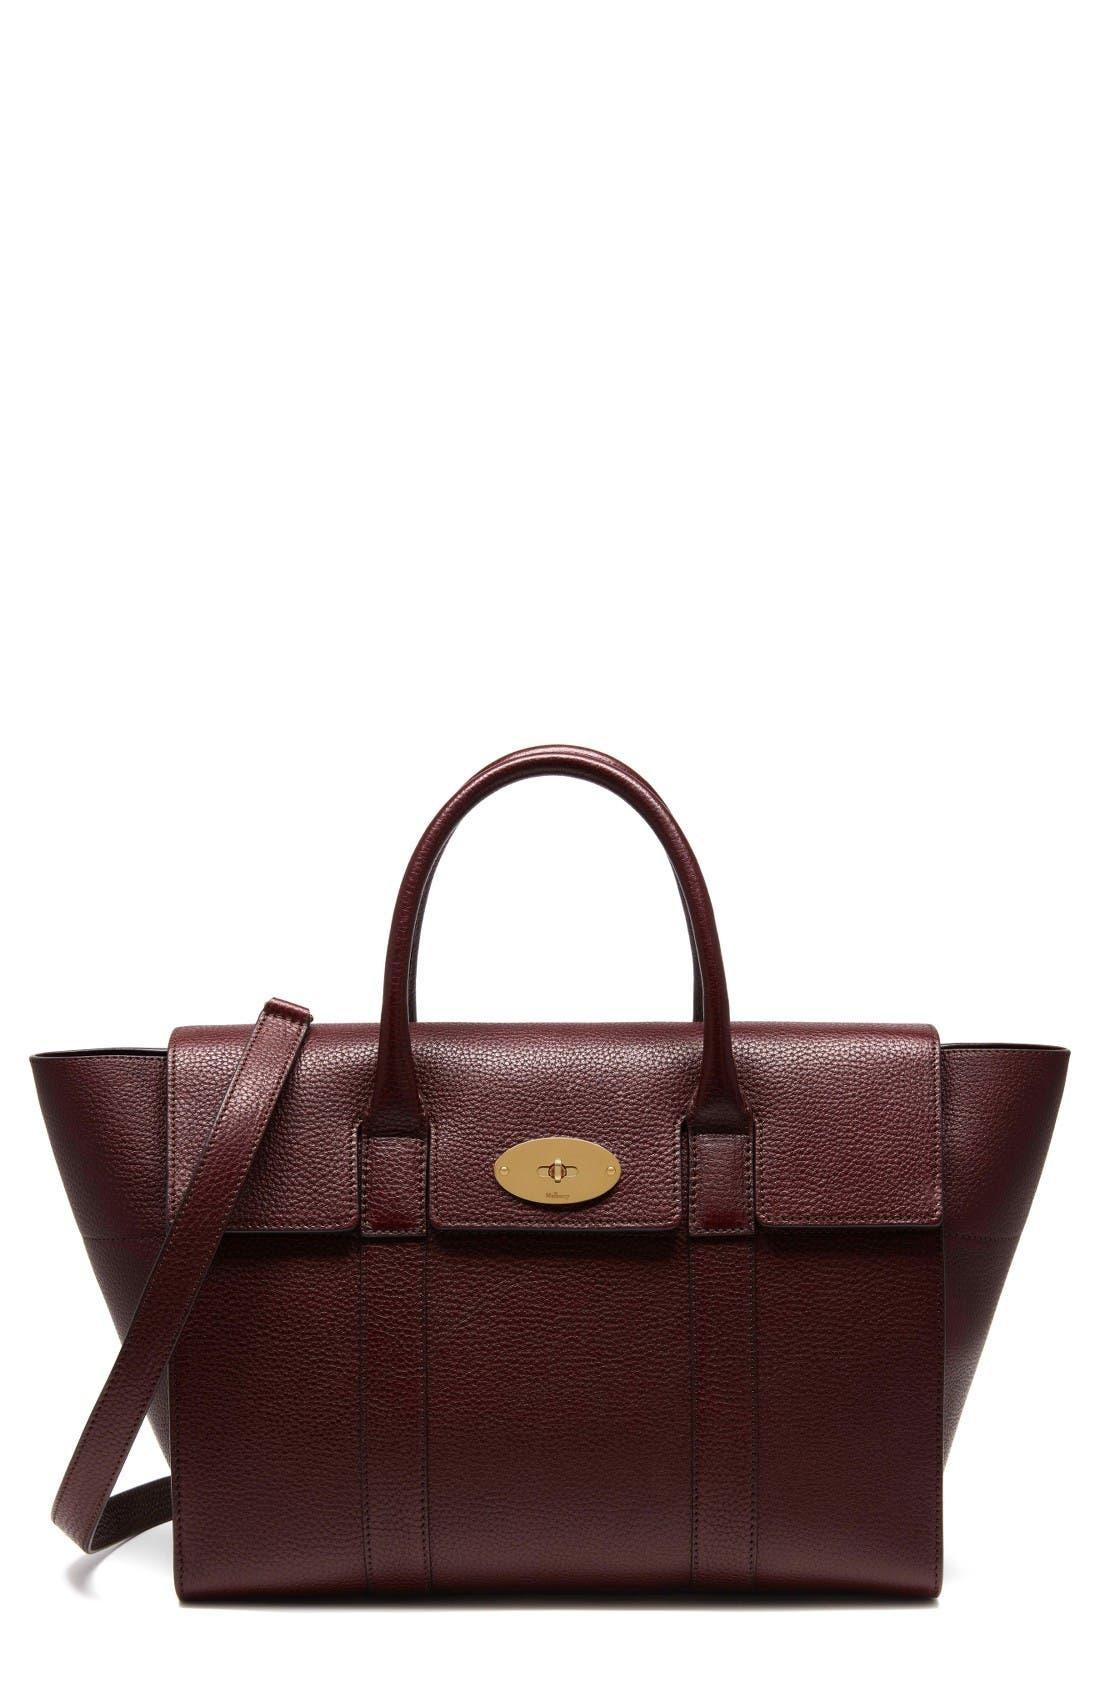 Bayswater Calfskin Leather Satchel,                         Main,                         color, Oxblood